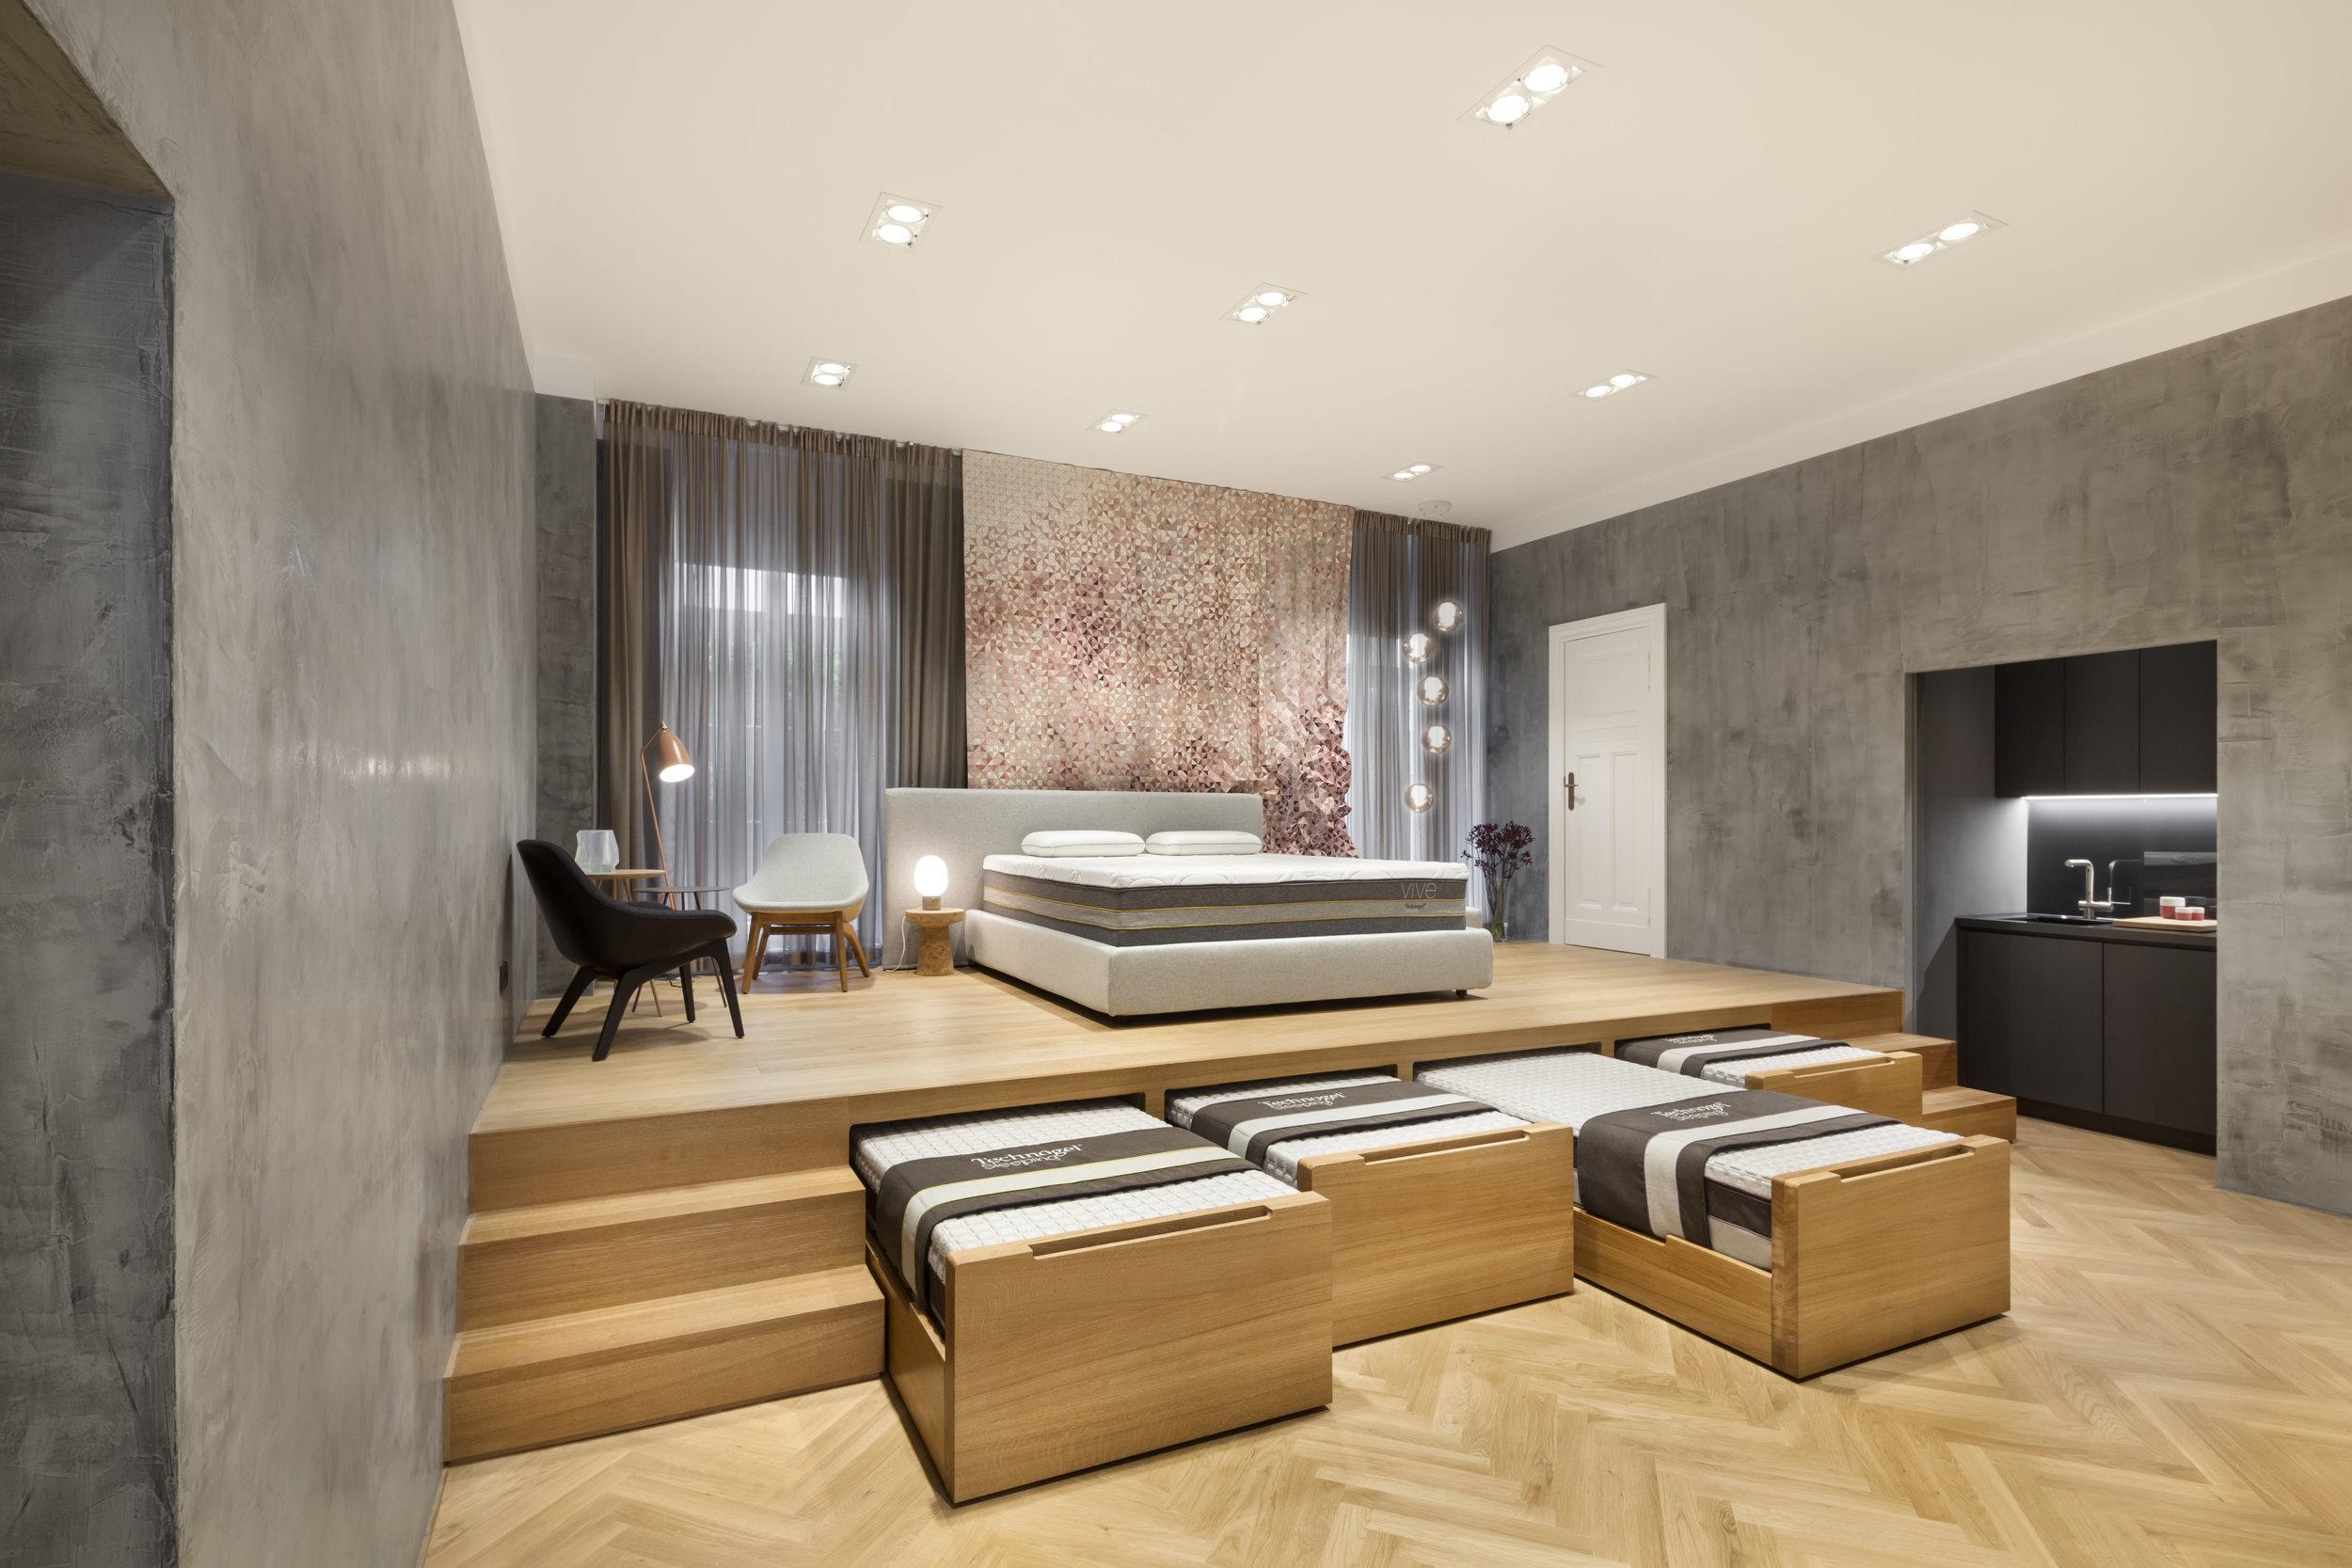 technogel-experience-center_retail-interior-design_coordination-berlin_08.jpg